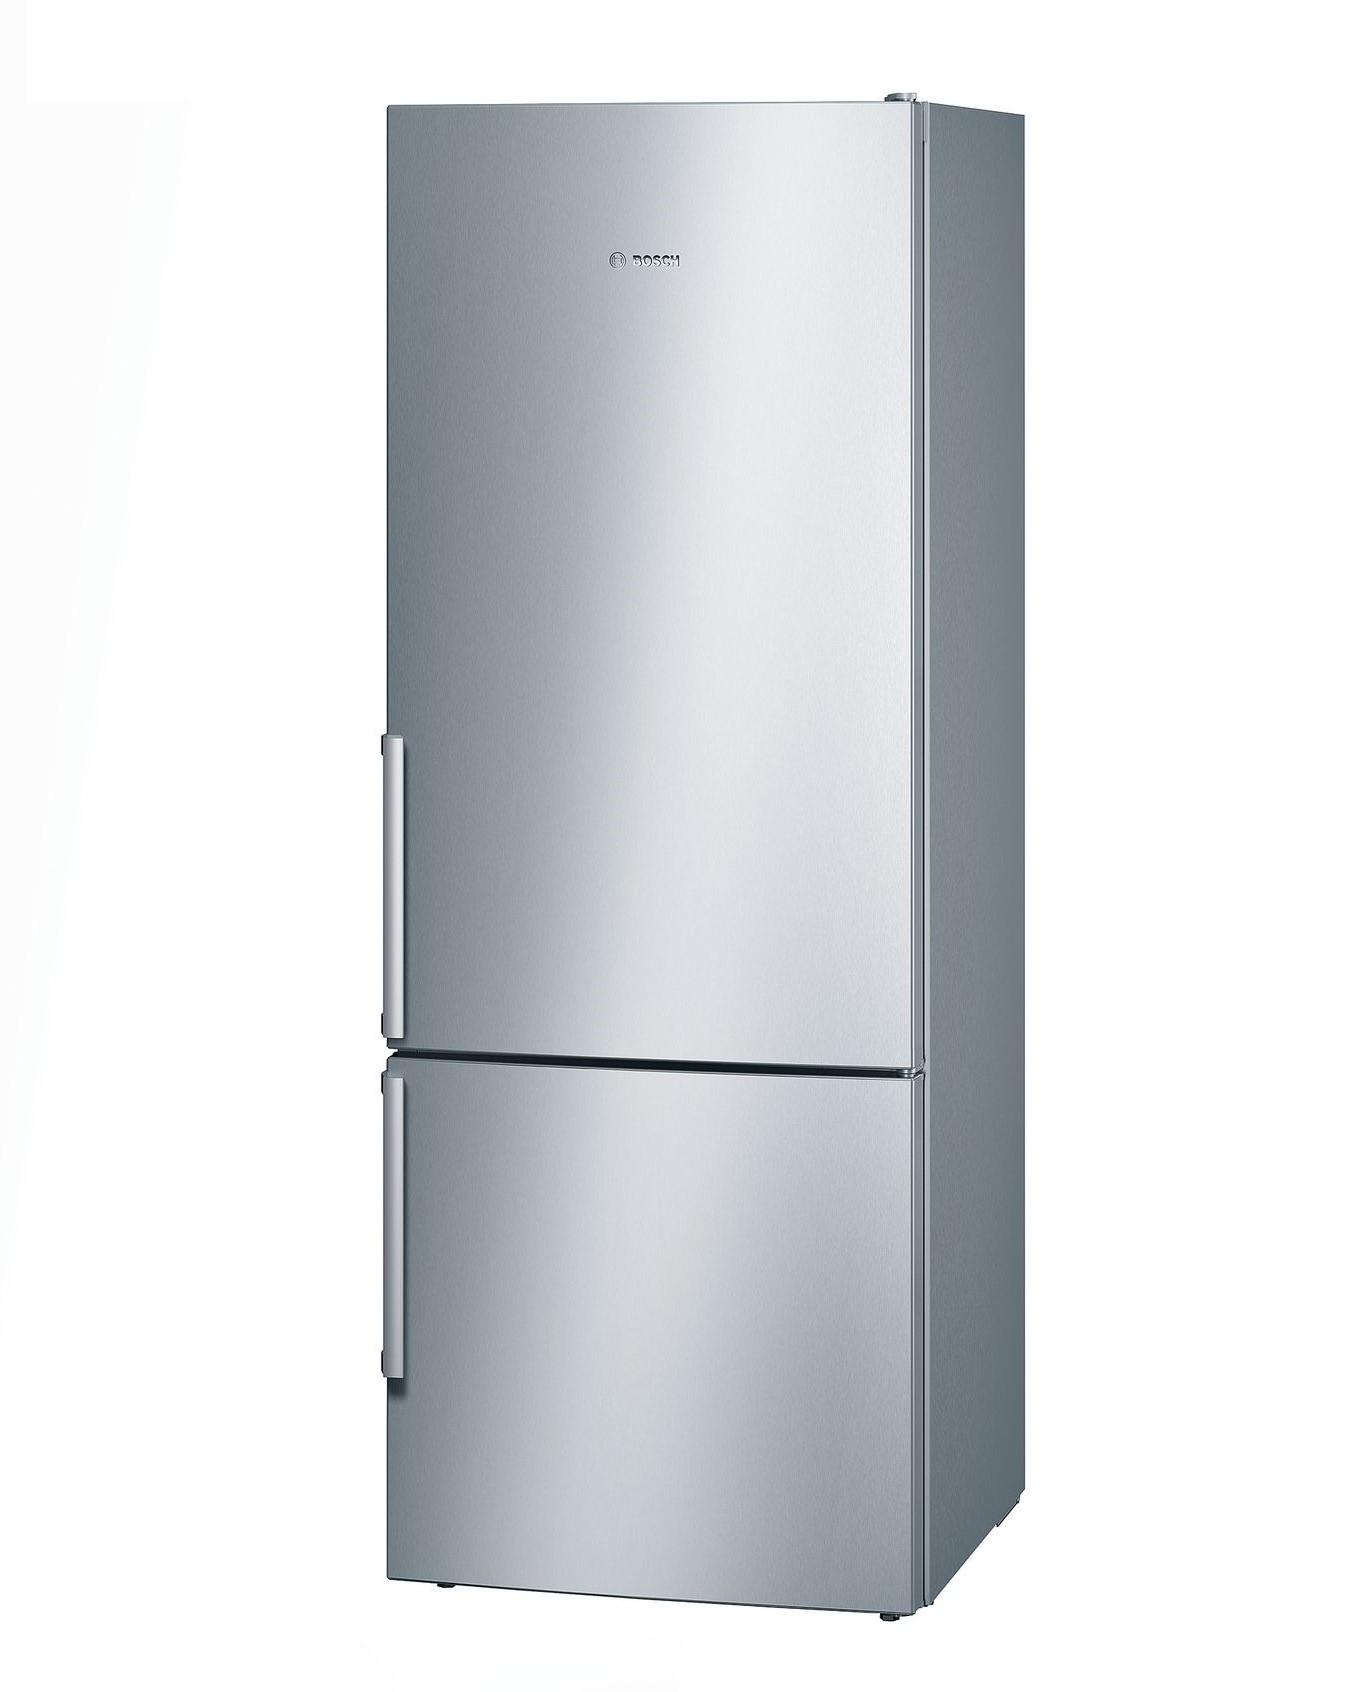 Bosch Serie | 8 free-standing fridge-freezer with freezer at bottom Stainless steel (with anti-fingerprint) KGN57PI20U